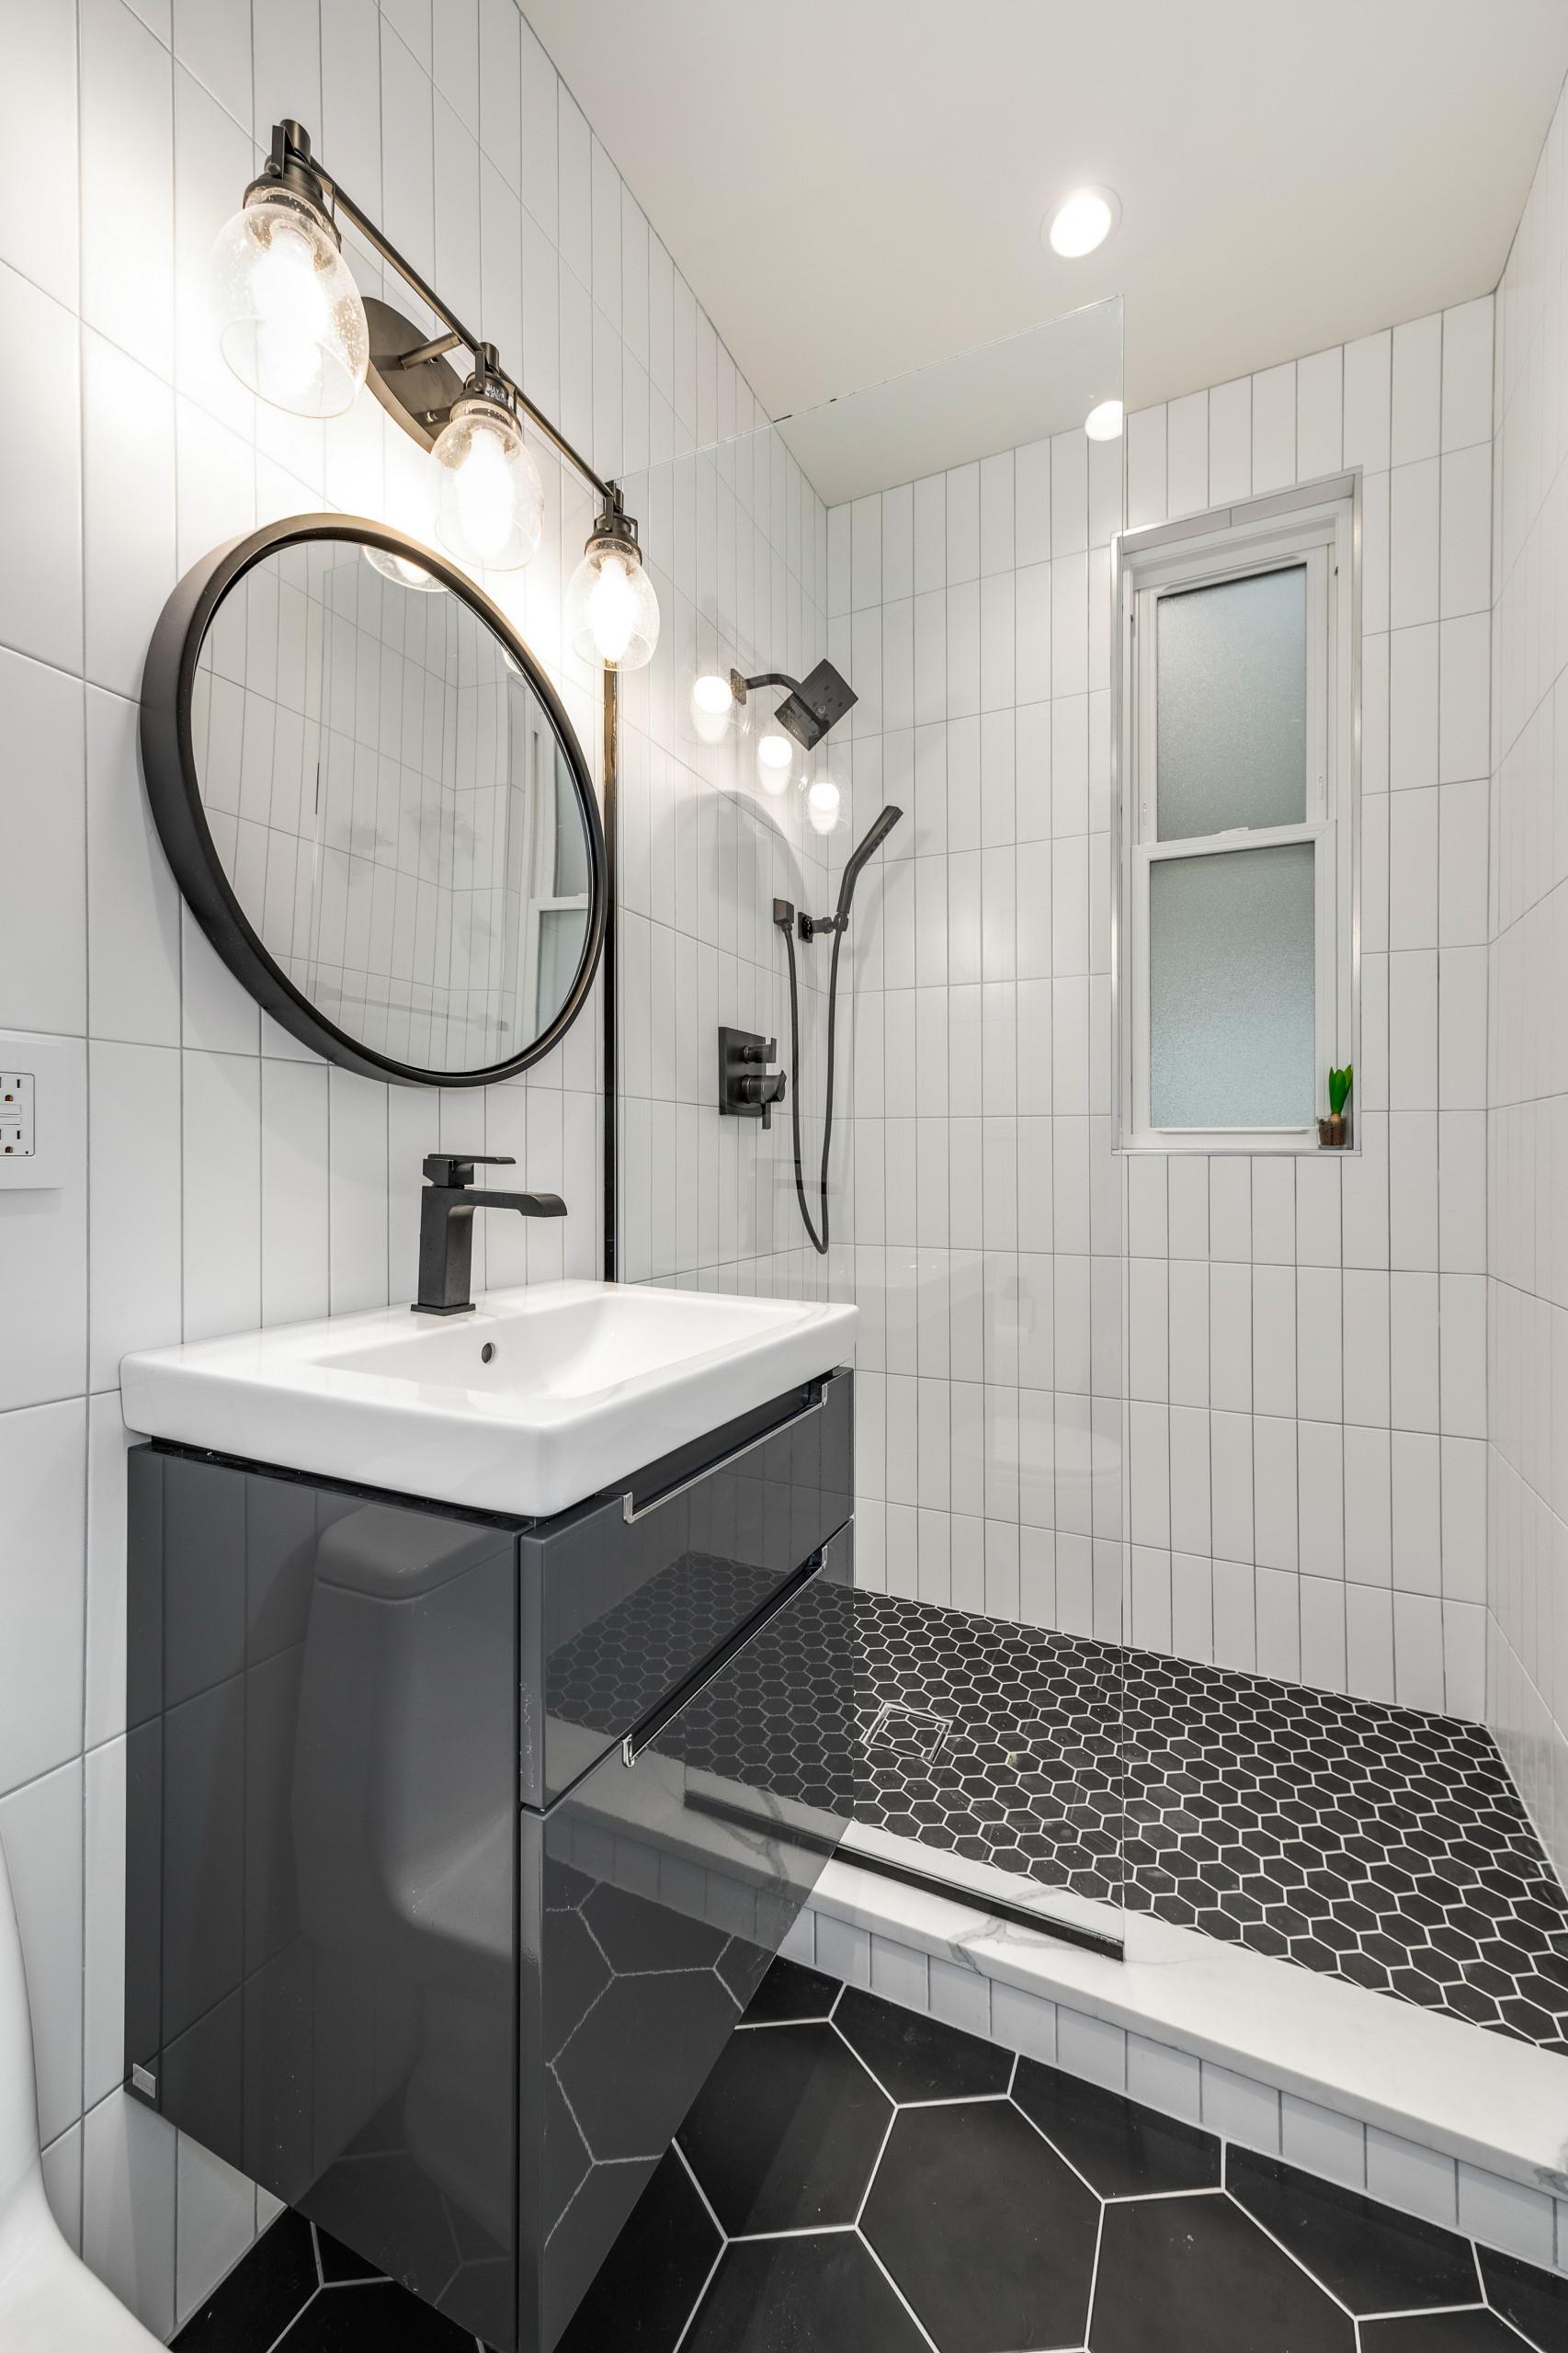 10 Beautiful Porcelain Tile Bathroom Pictures & Ideas - January